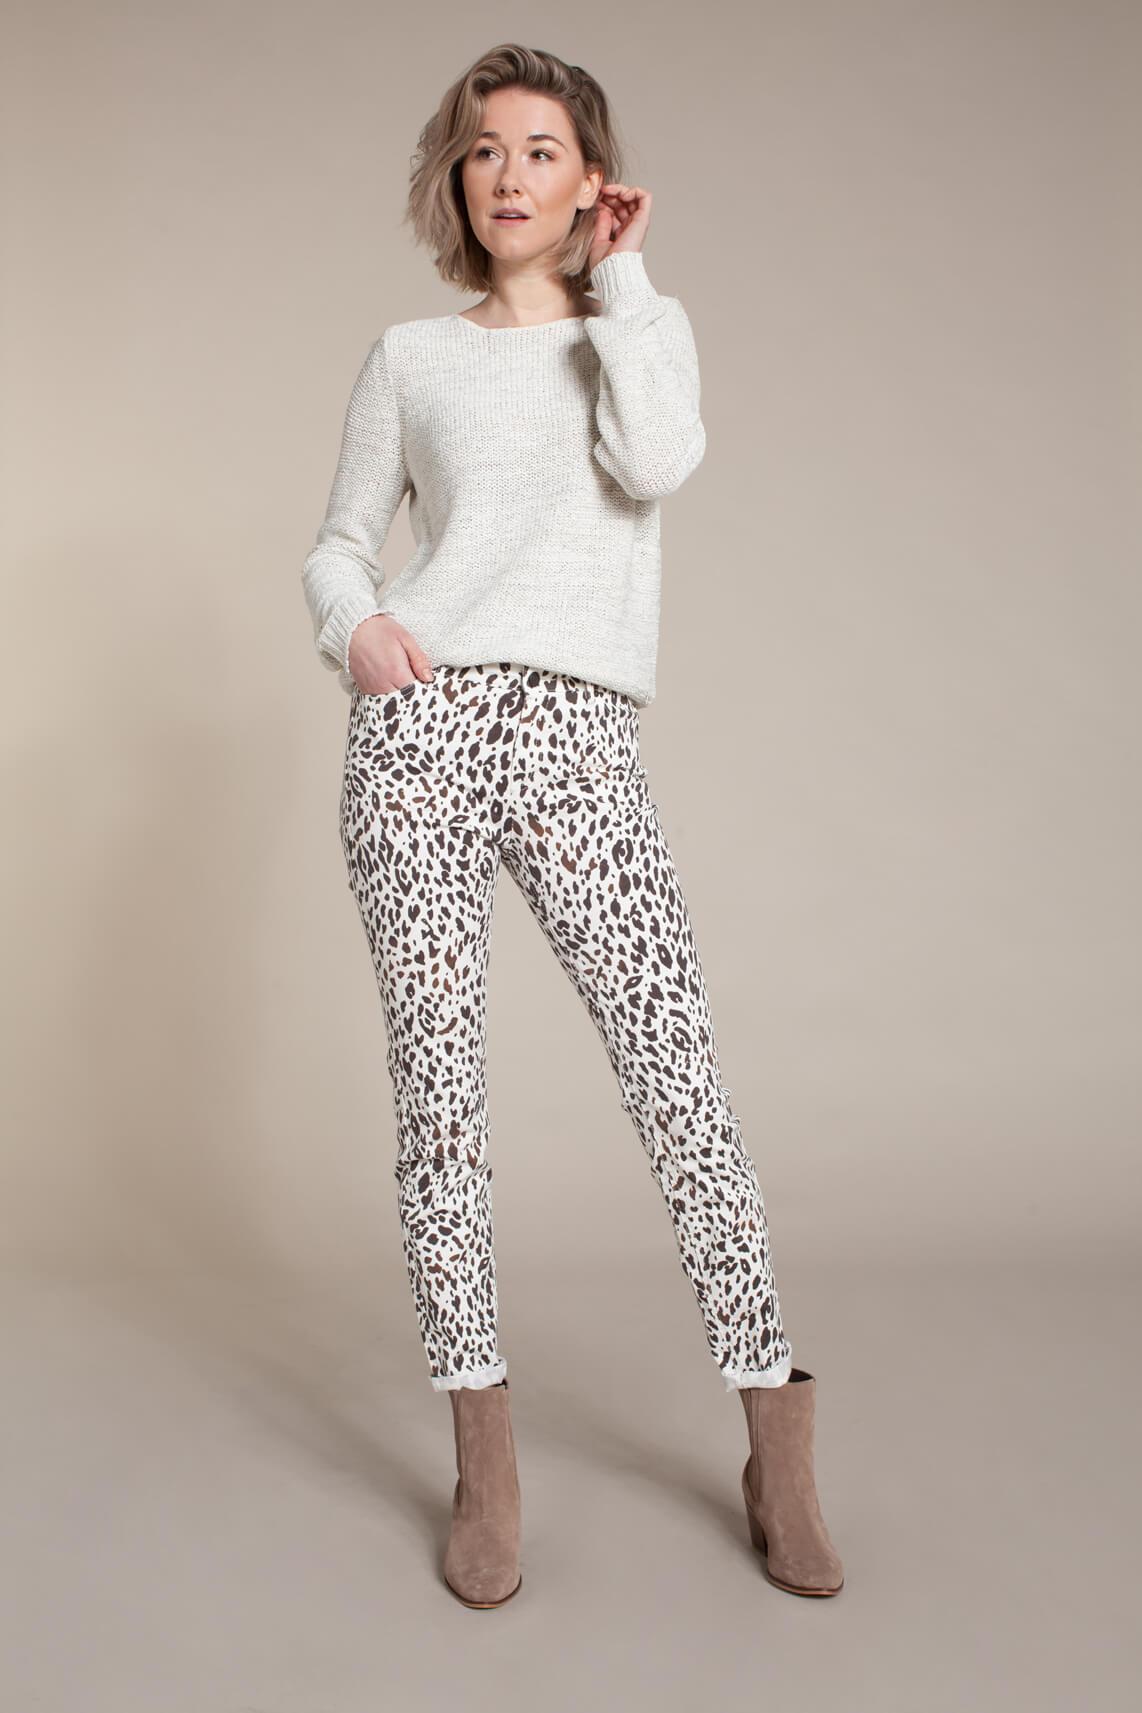 Anna Dames Pullover in bandgaren wit